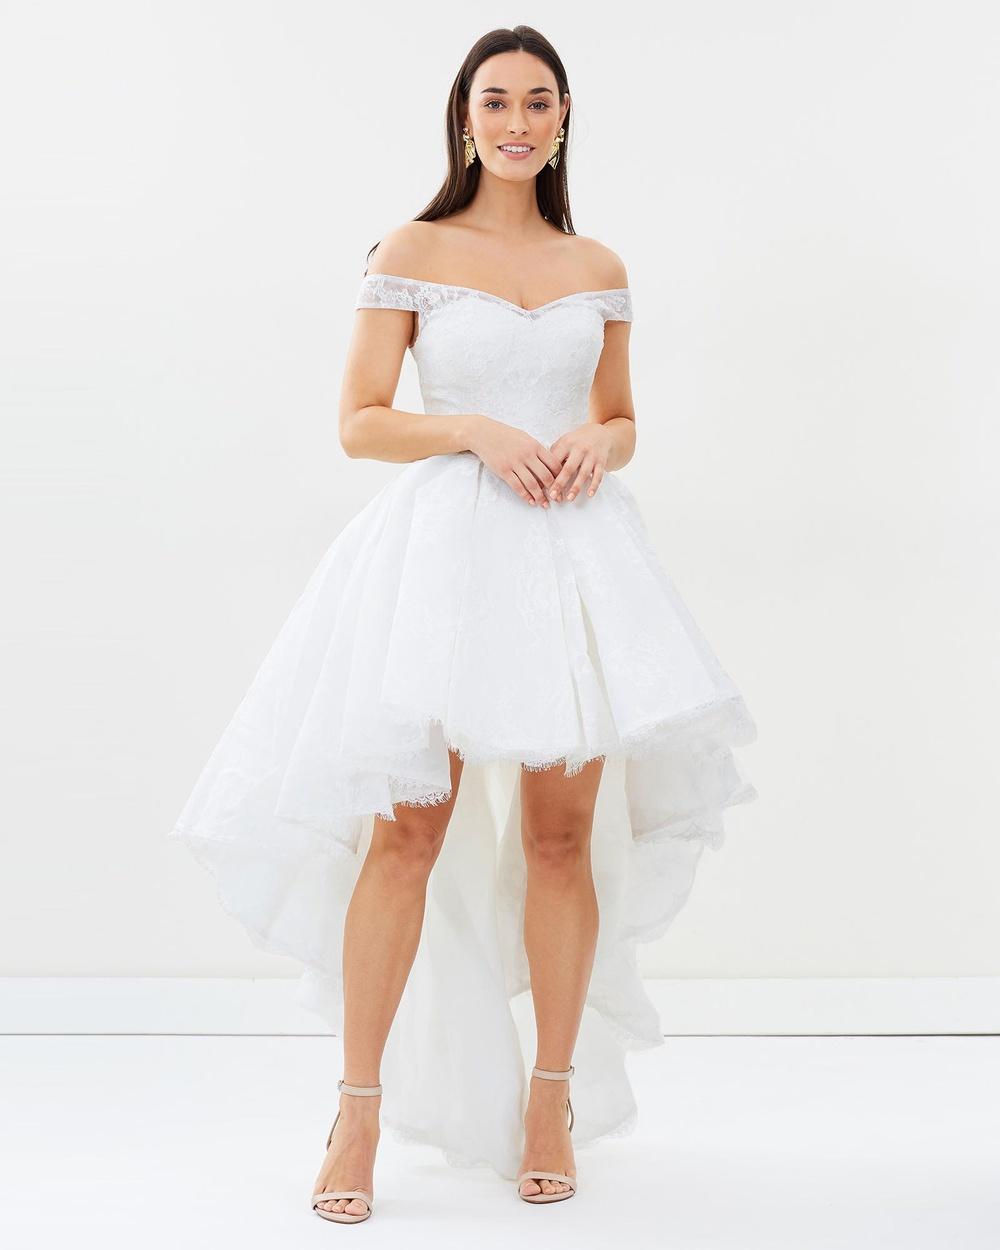 ROXCIIS Adele Hi Low Dress Dresses White Adele Hi-Low Dress